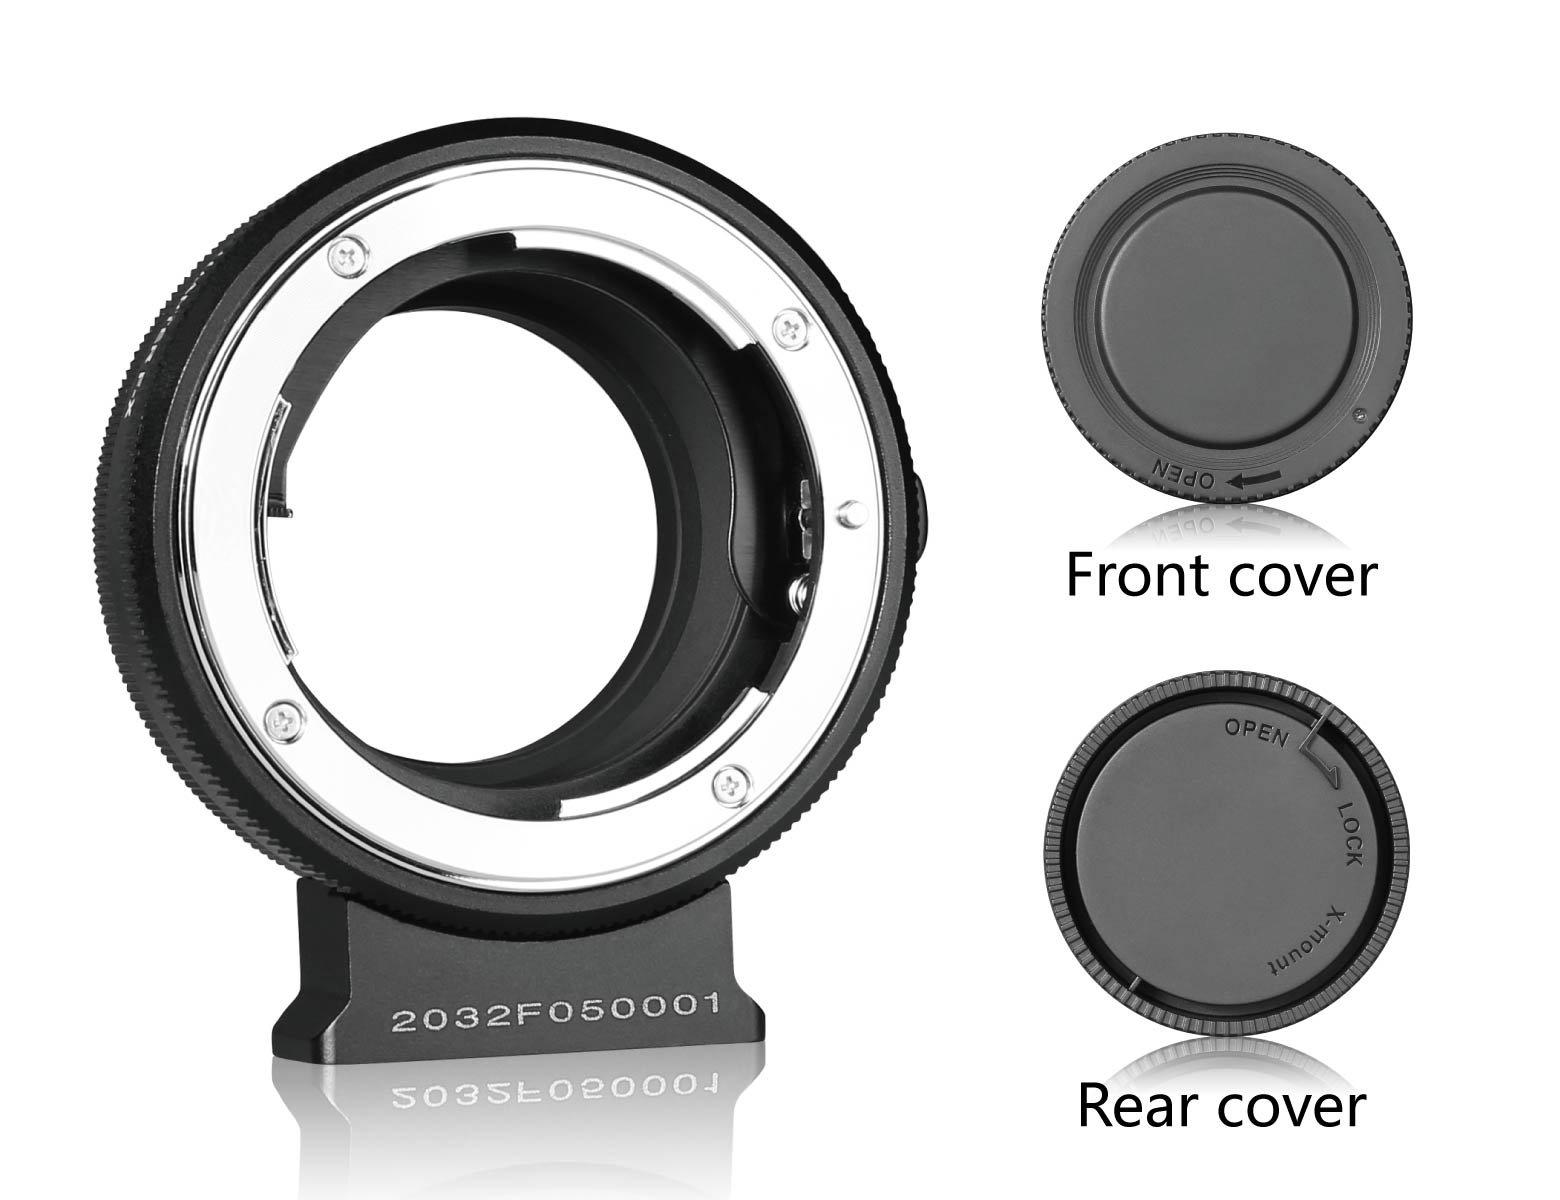 MEIKE MK-NF-F Mount Manual Adapter Ring Professional Design for Nikon F-Mount Lens to Fuji Mirrorless X-mount Camera X-T1 X-T2 X-Pro1 X-Pro2 X-T10 etc(Black